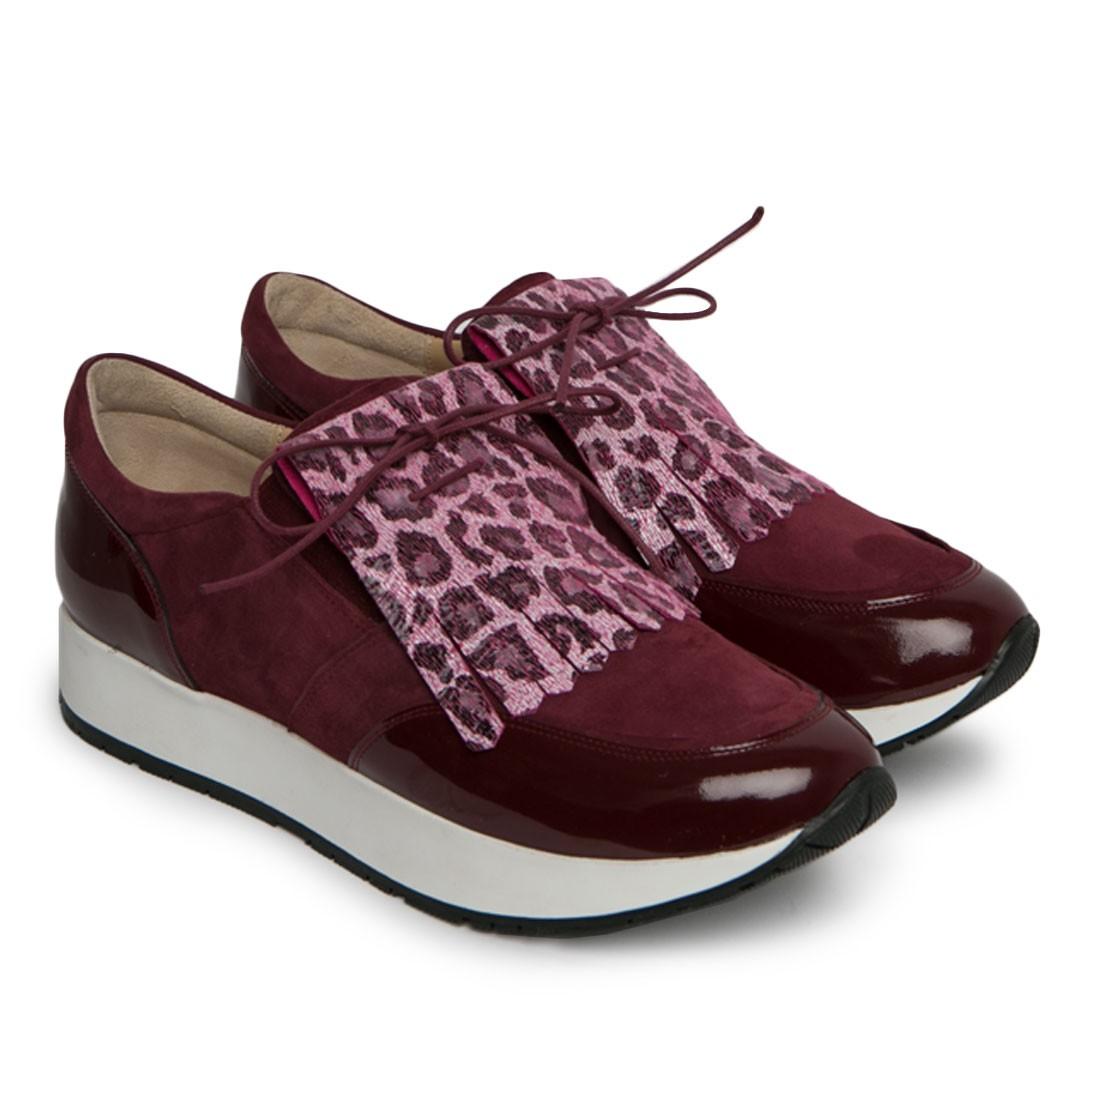 Zapato Granateguinda Blucher Rosalia Rosalia Blucher Granateguinda Rosalia Mujer Granateguinda Mujer Zapato 4Aq5RjL3